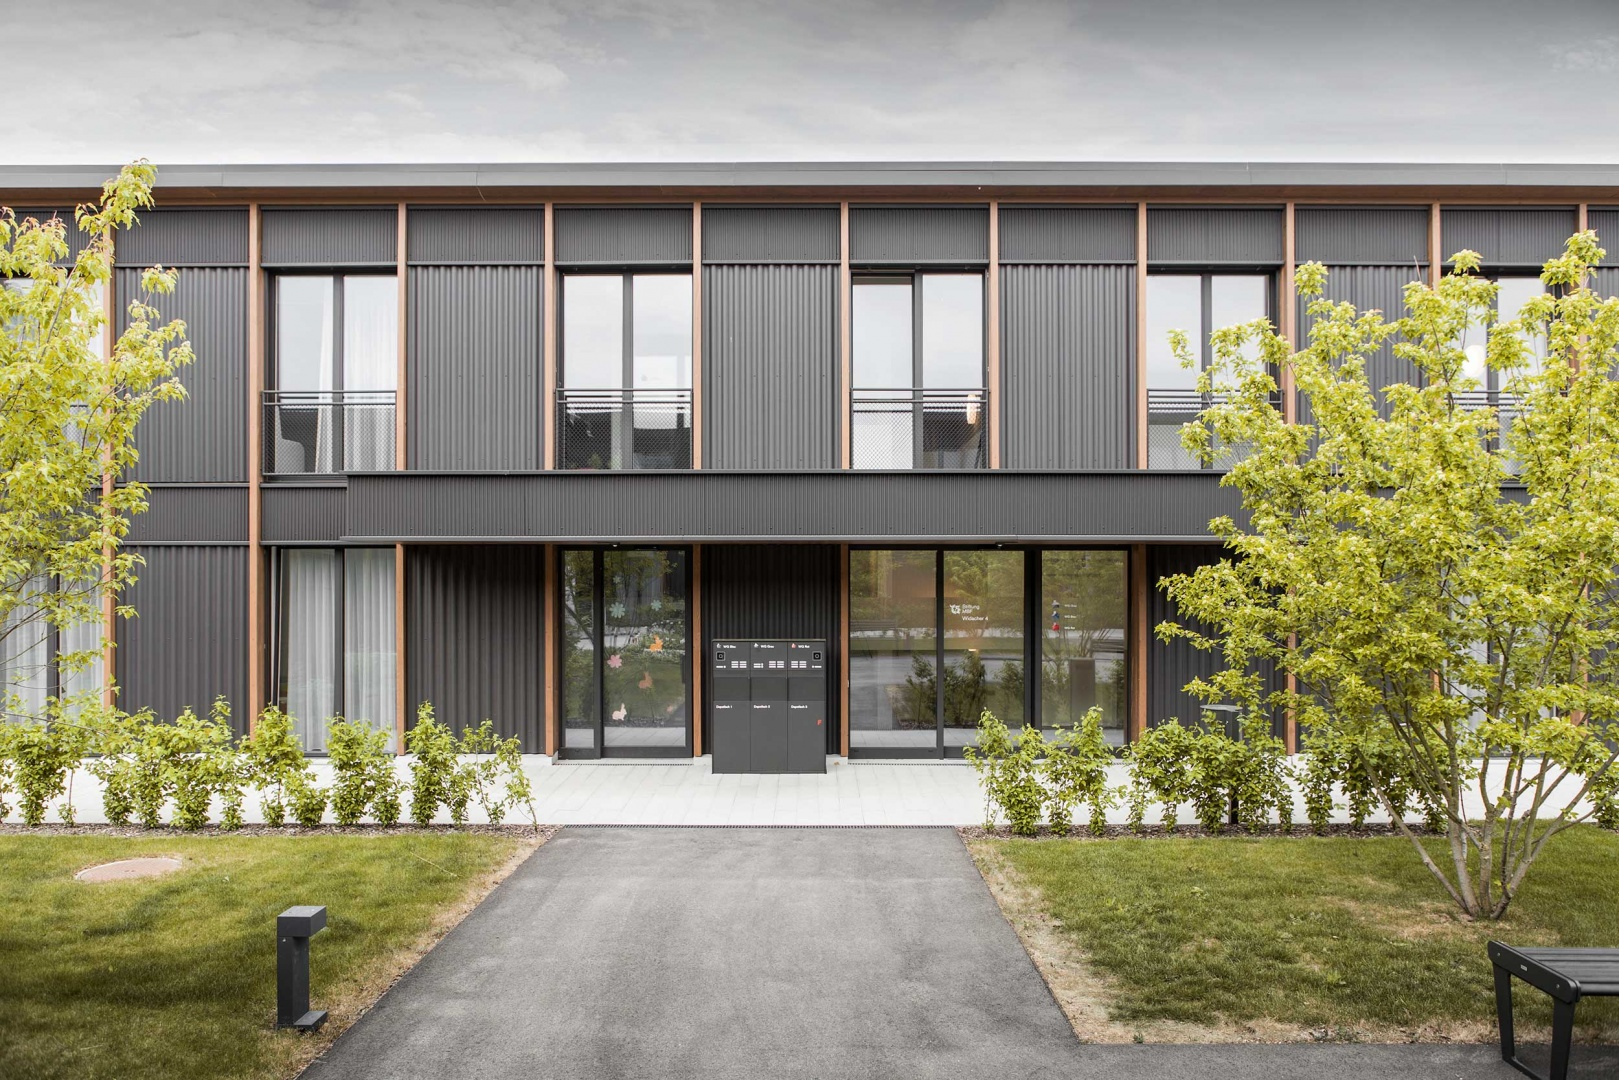 Eingang Wohnheim © Schmid Ziörjen Architektenkollektiv